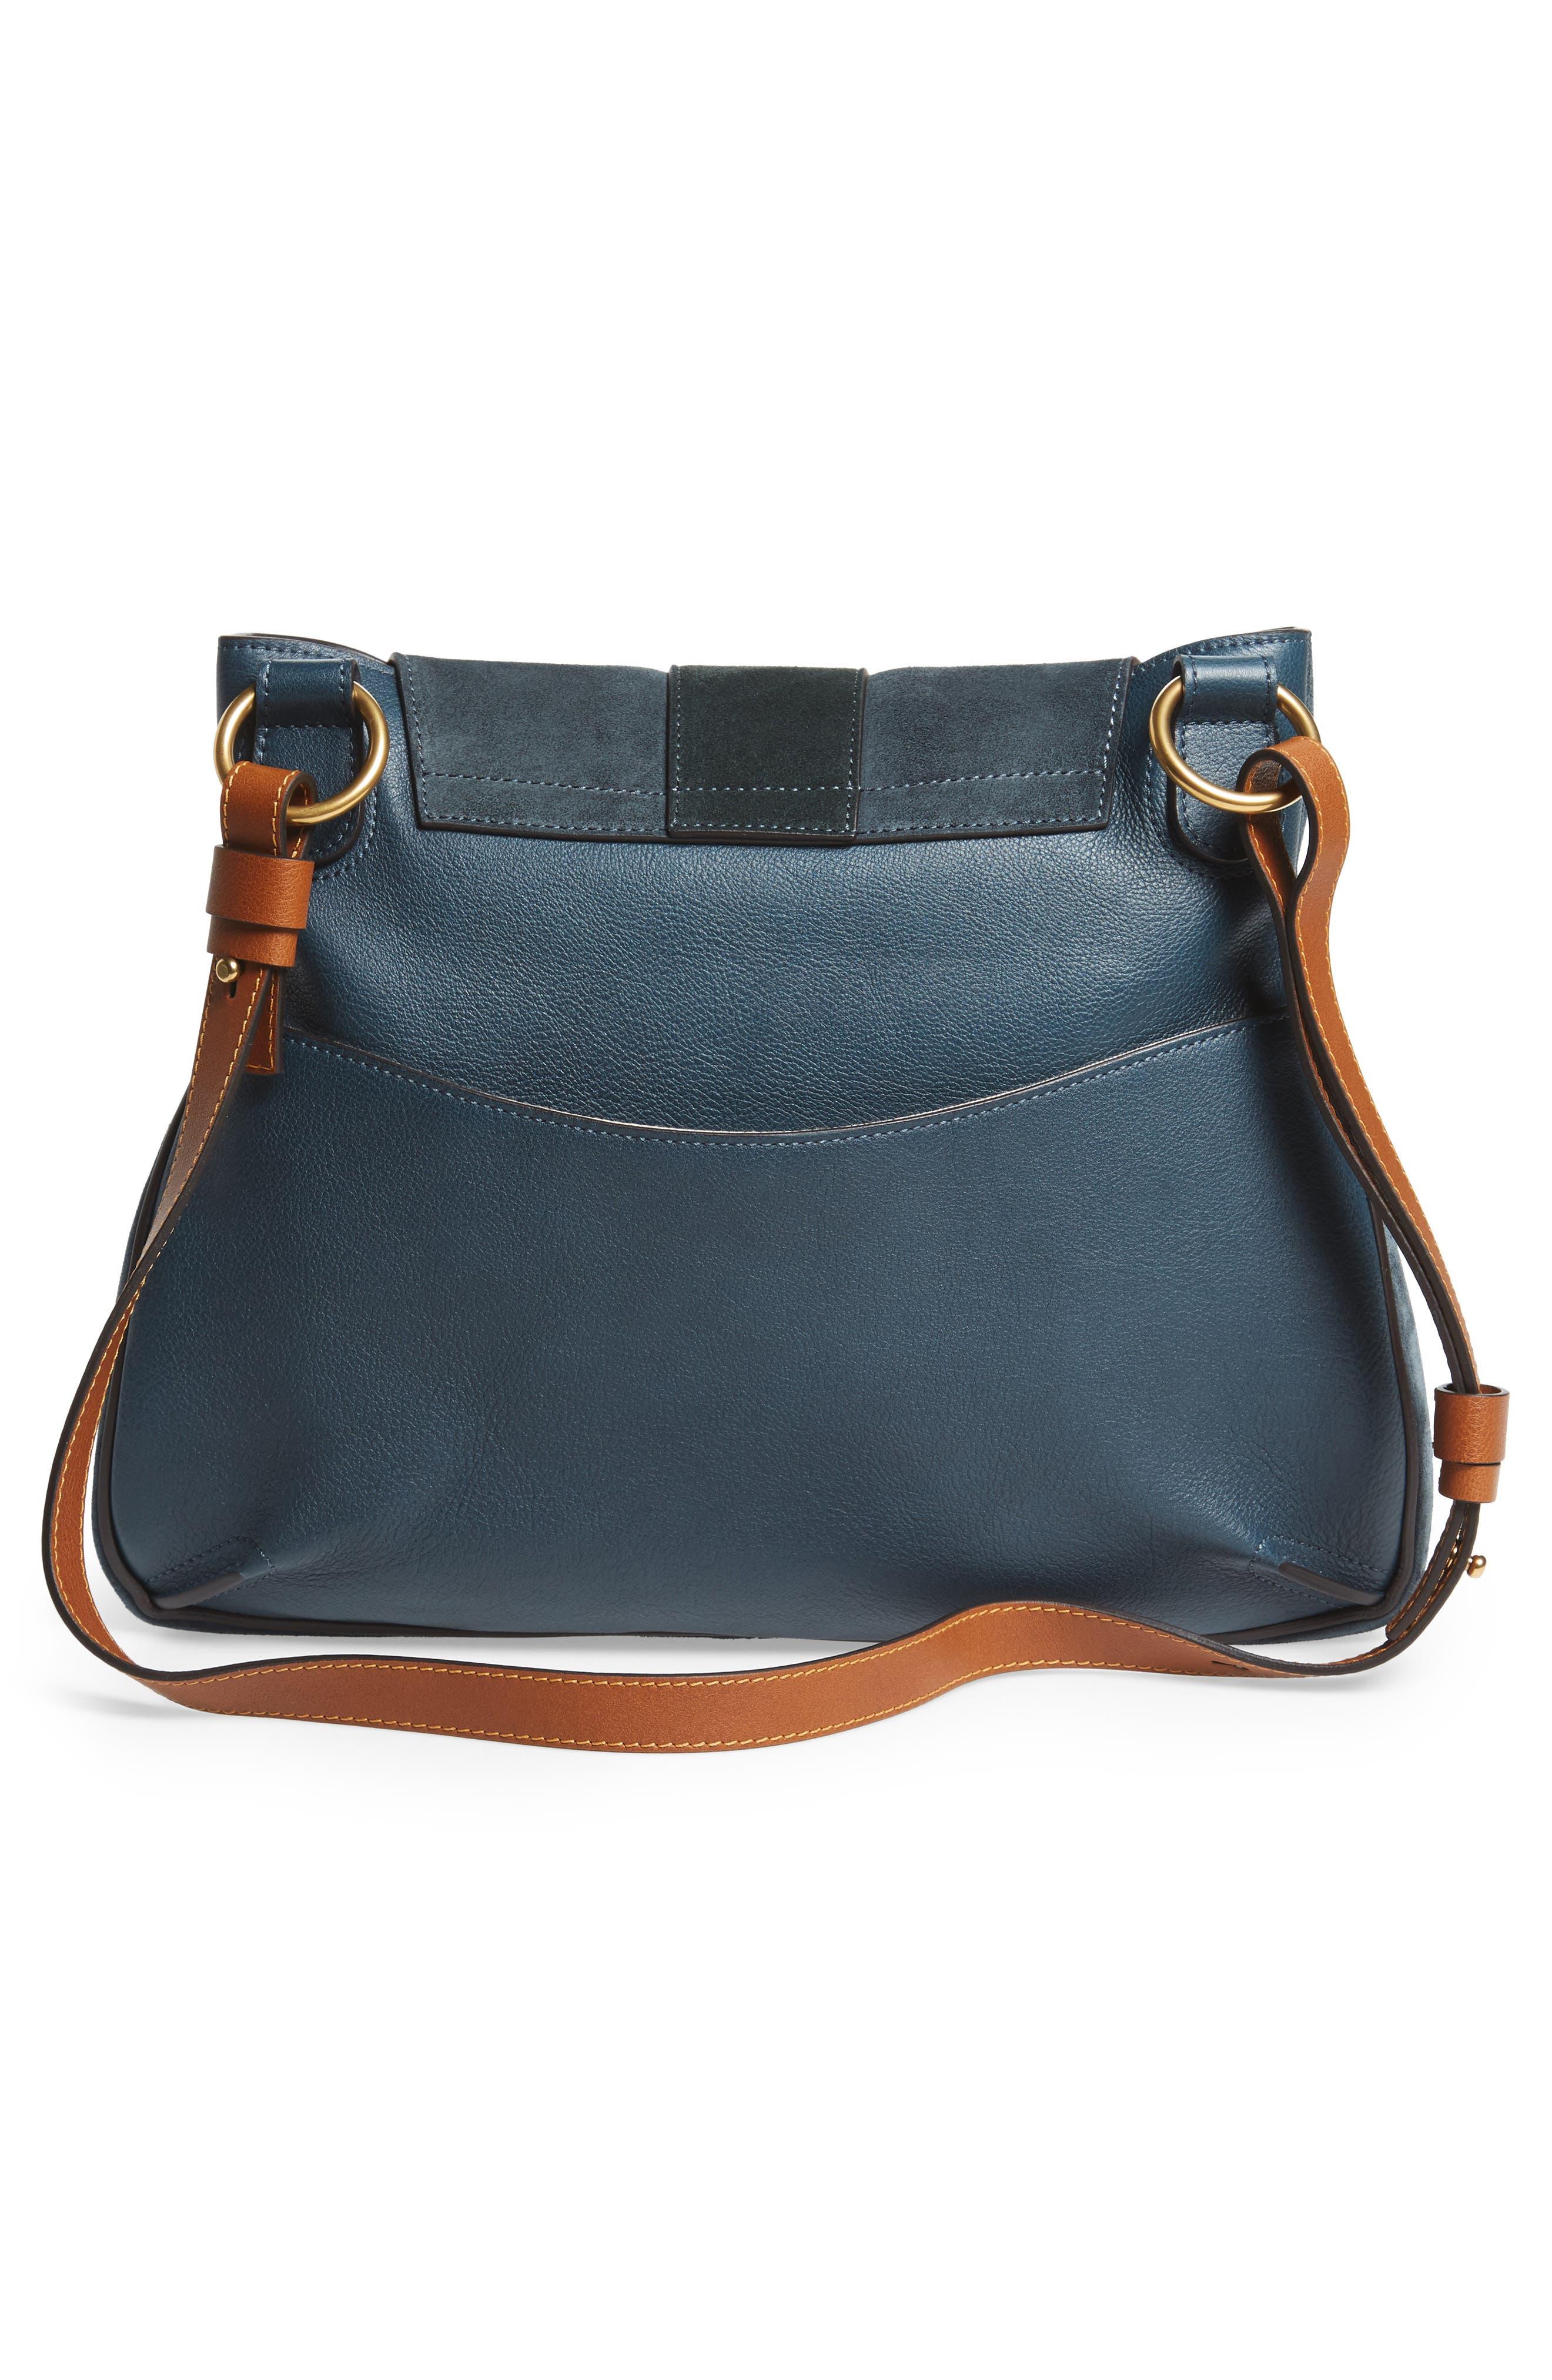 Medium Lexa Leather Shoulder Bag,                             Alternate thumbnail 6, color,